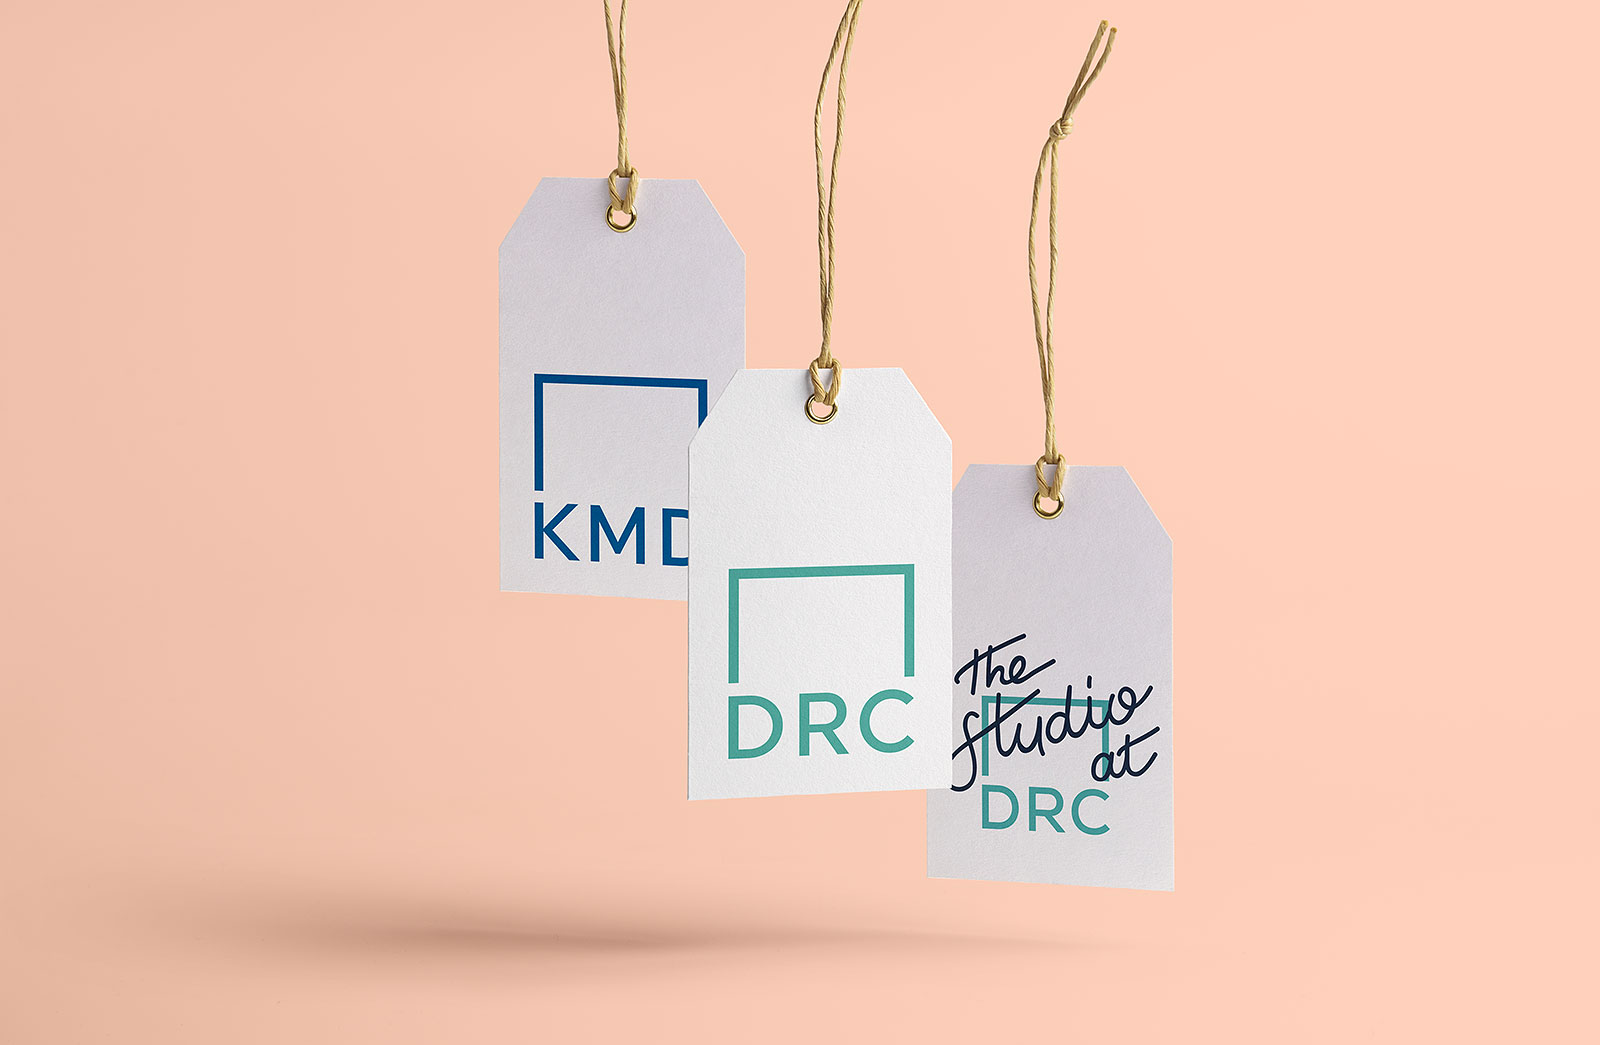 drc-interior-designer-company-branding_10.jpg